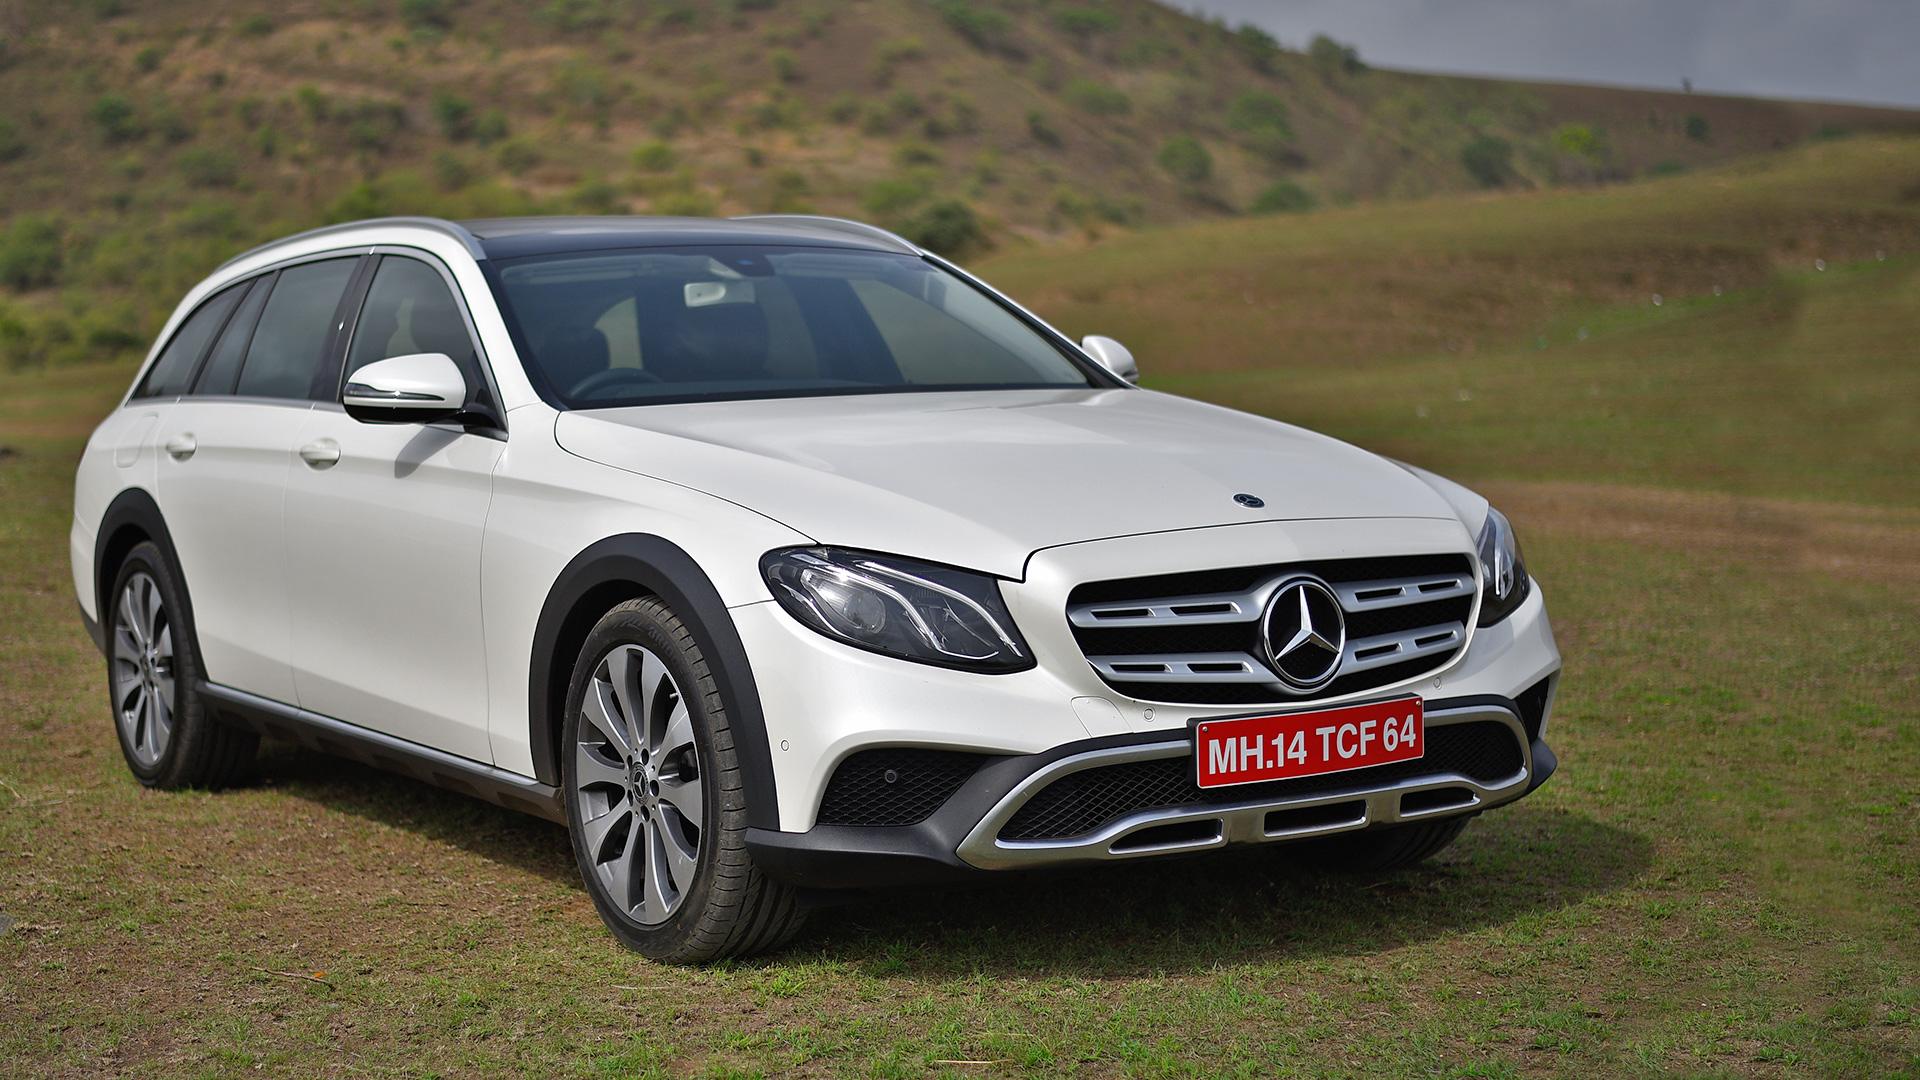 Mercedes Benz E class All Terrain 2018 E 220d Exterior Car s